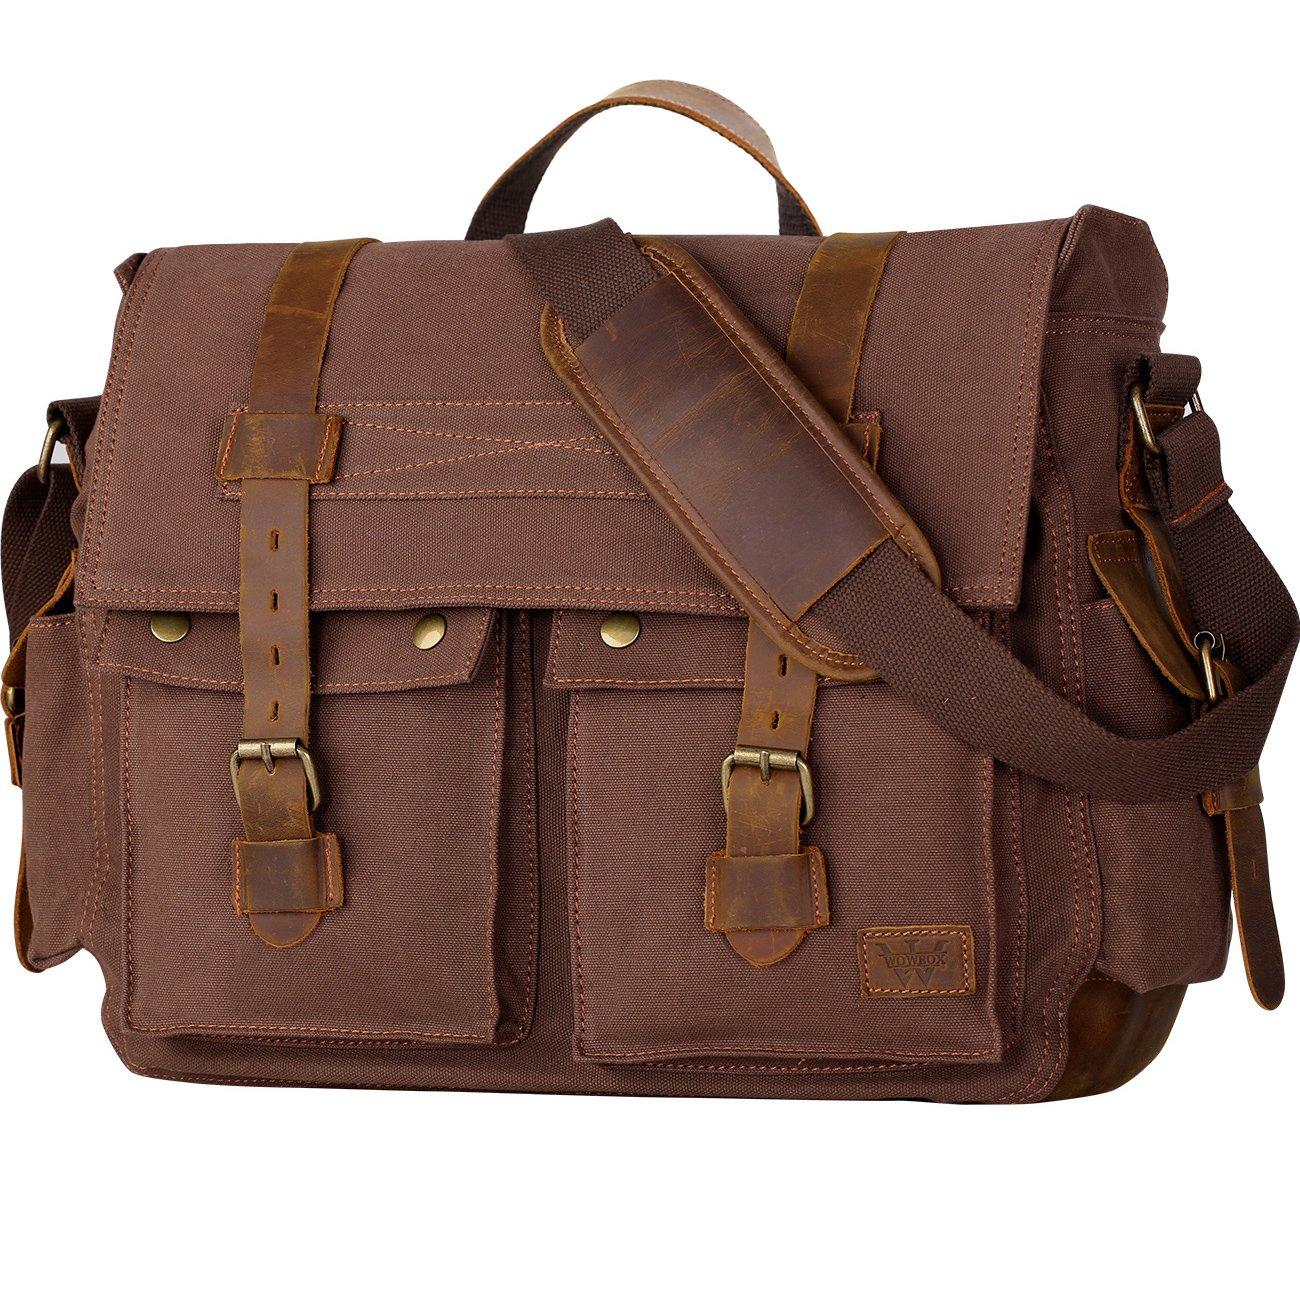 6a03a630d Amazon.com: Wowbox 17.3 Inch Men's Messenger Bag Vintage Canvas Leather  Satchel Laptop Bags Bookbag Working Bag for Men and Women Coffee: Computers  & ...